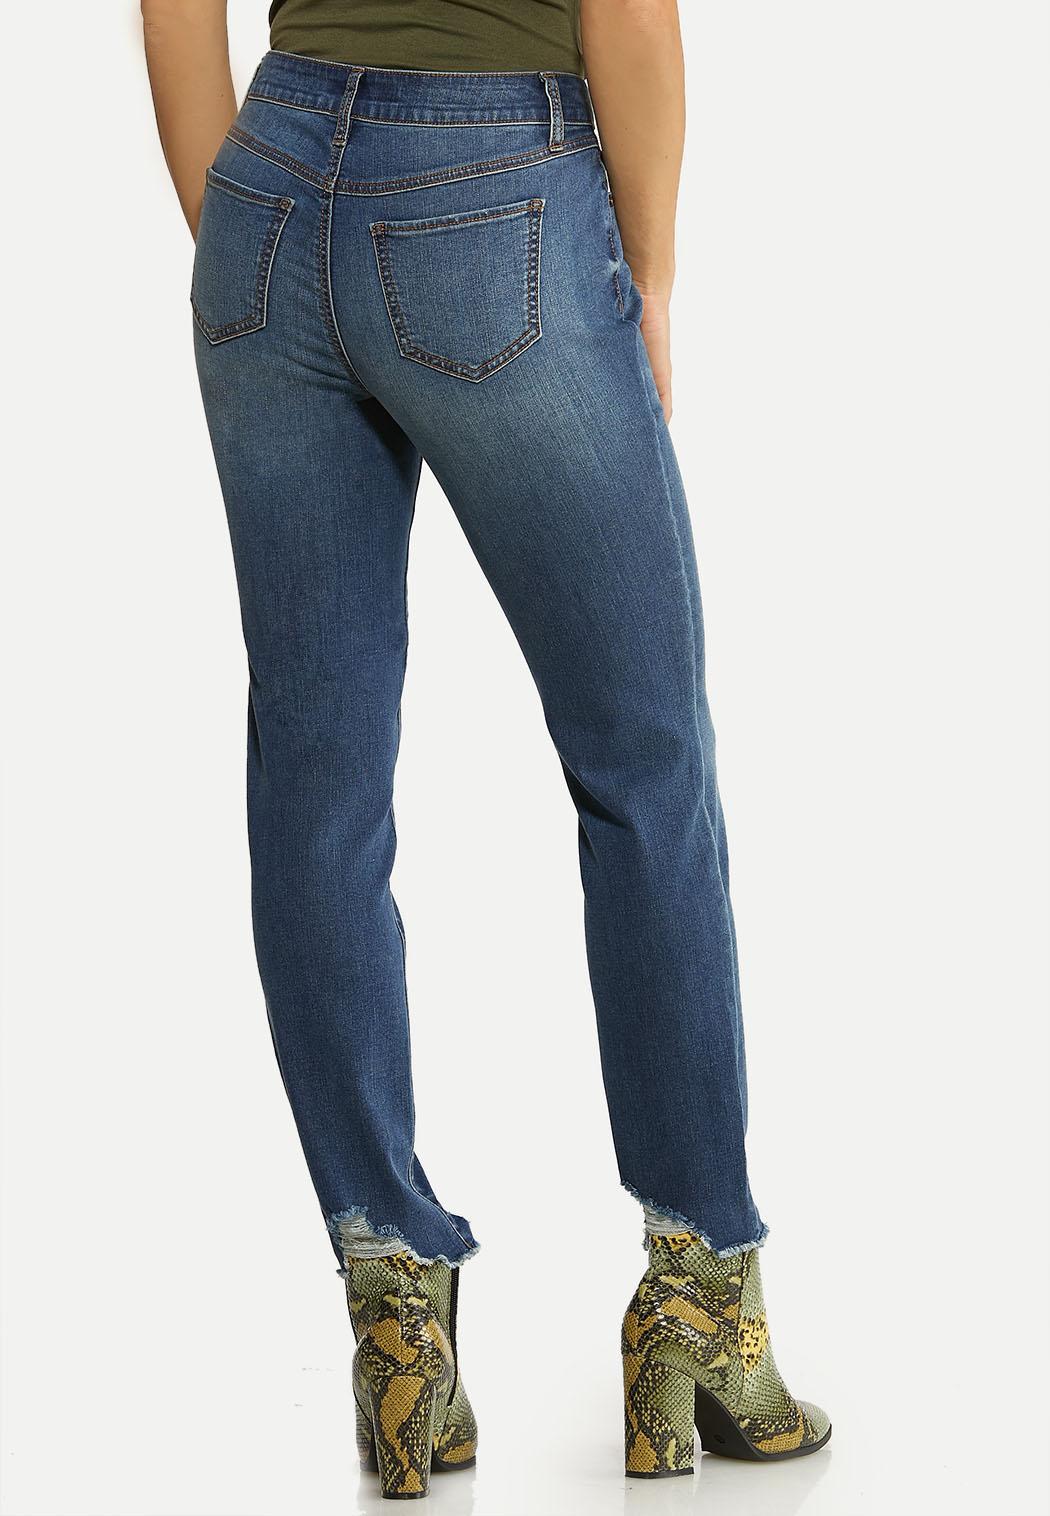 Distressed Hem Skinny Jeans (Item #44097452)